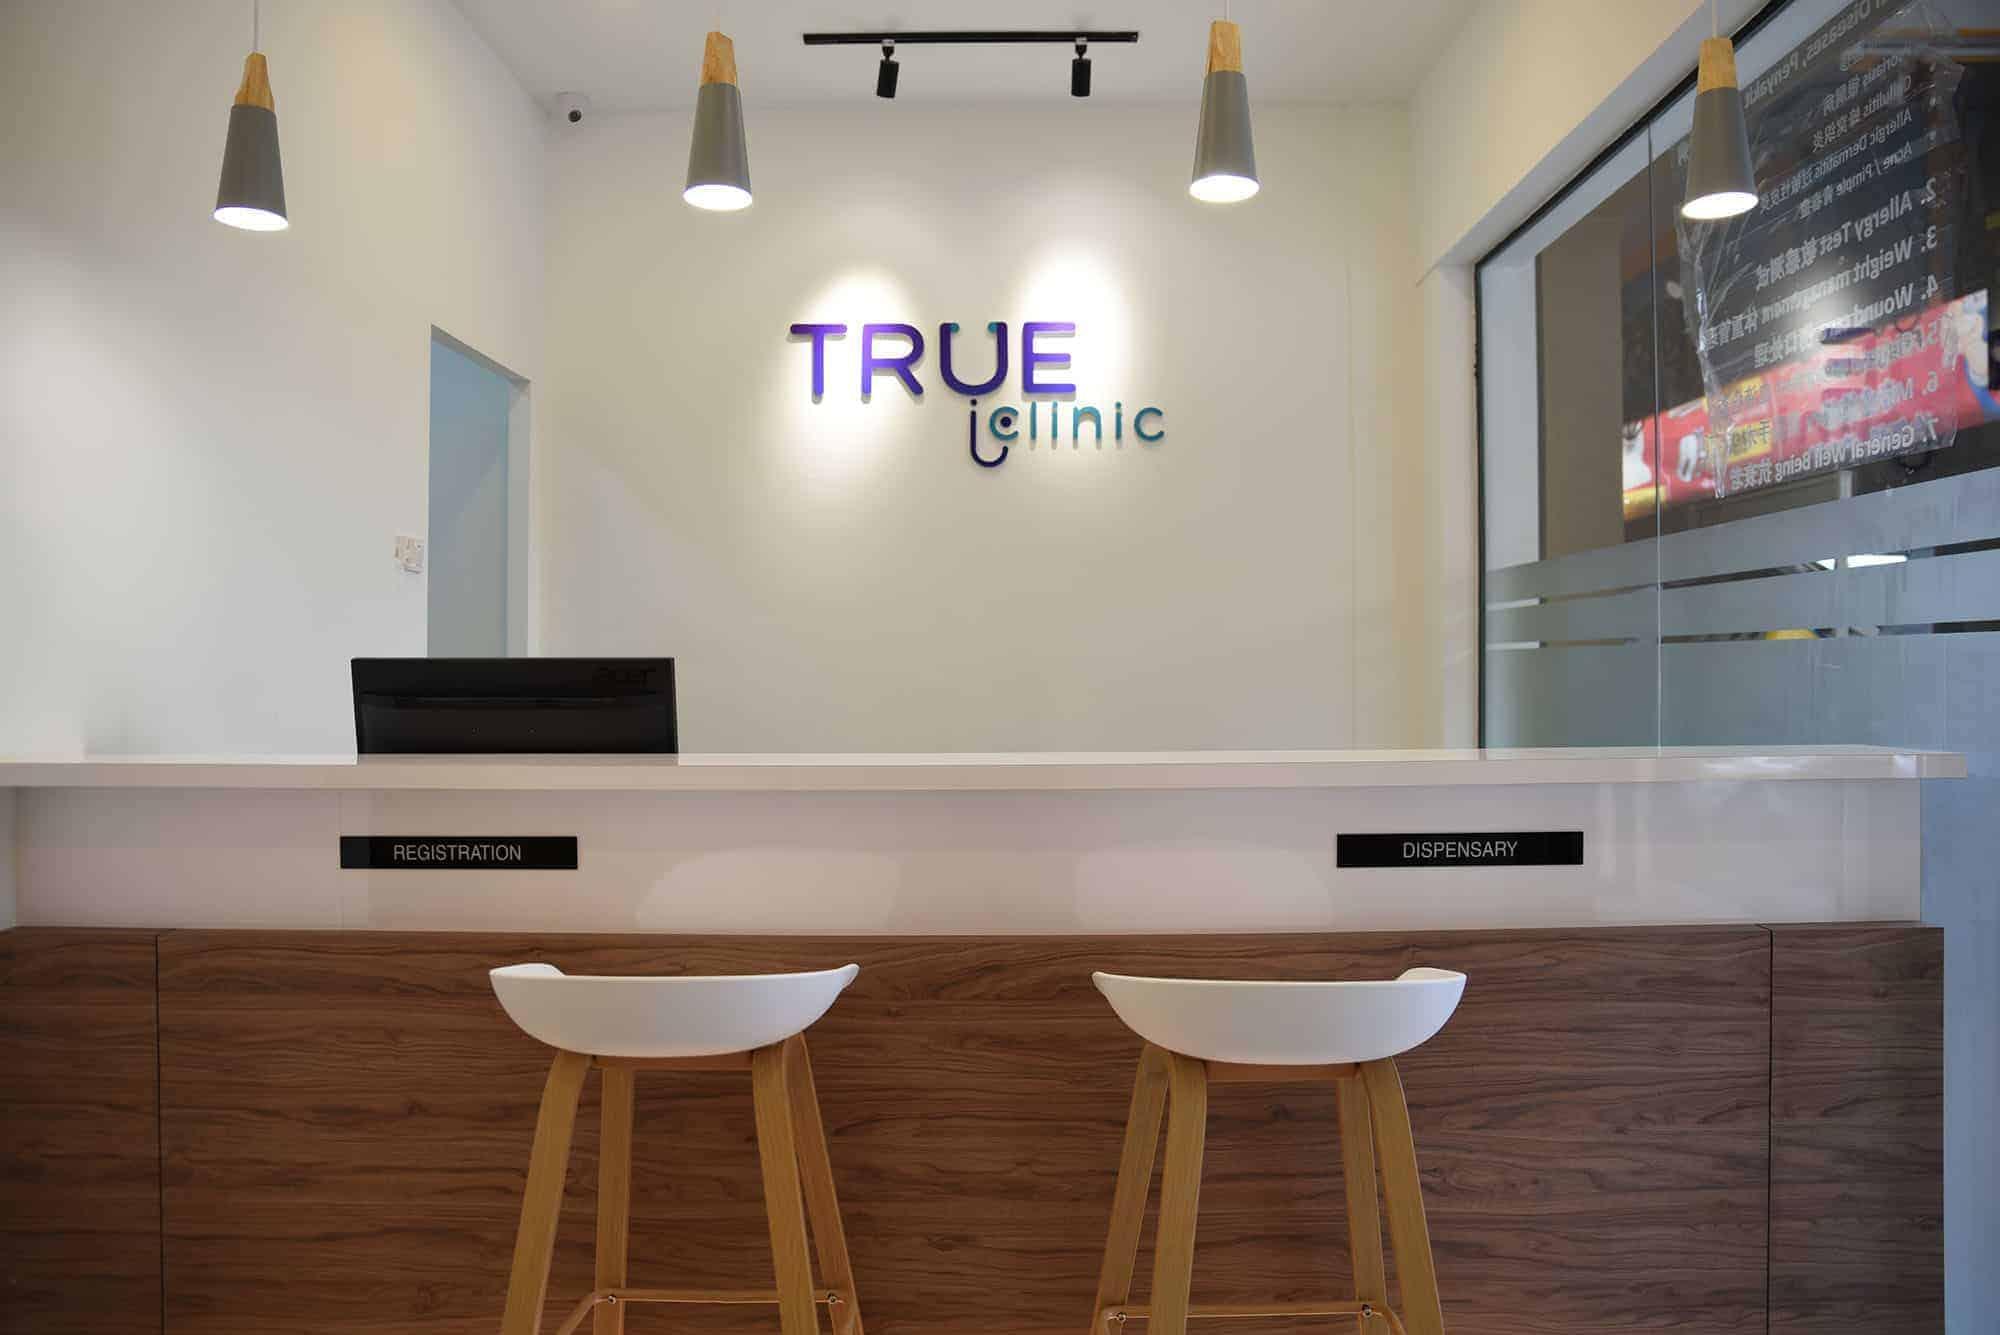 True Clinic, Skin (Dermatology) Clinic located at Kota Damansara, KL